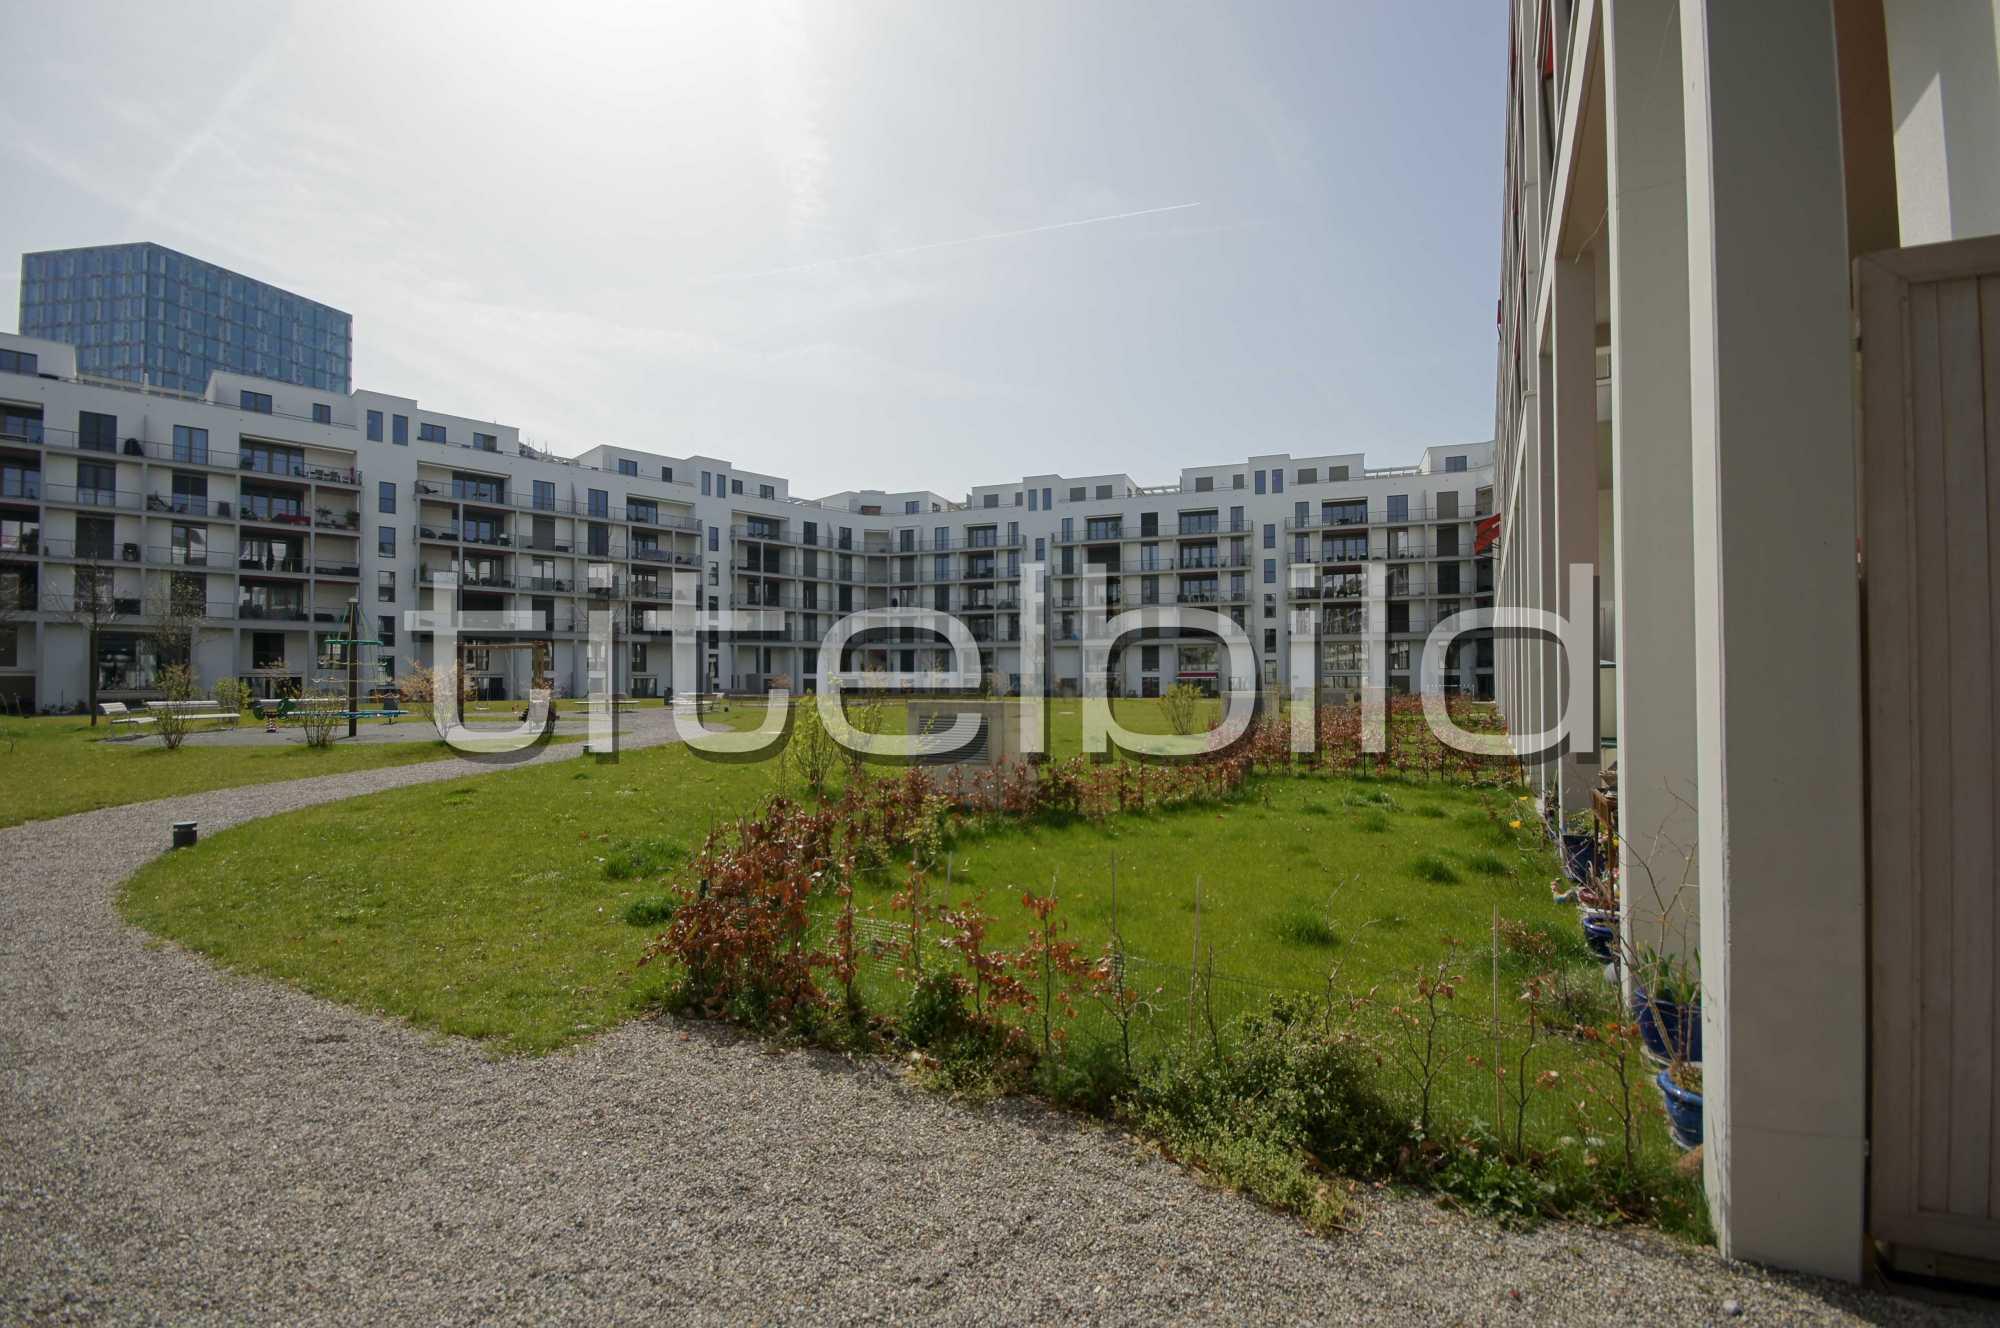 Projektbild-Nr. 5: Richti Areal Konradhof, Baufeld 1/7